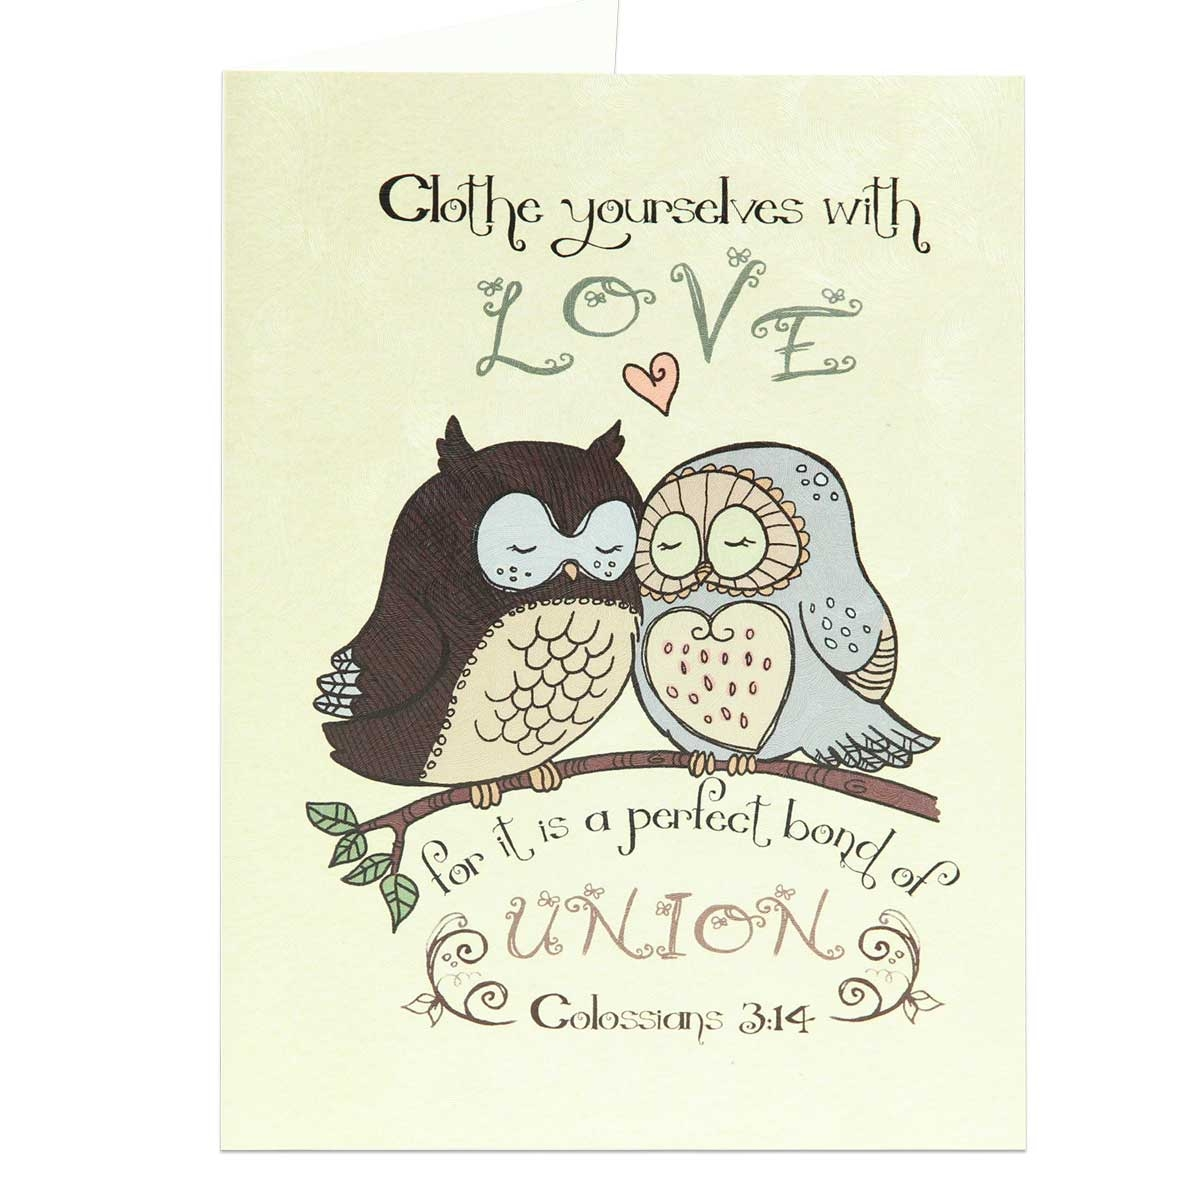 Colossians 314 Greeting Card Wedding Anniversary Card